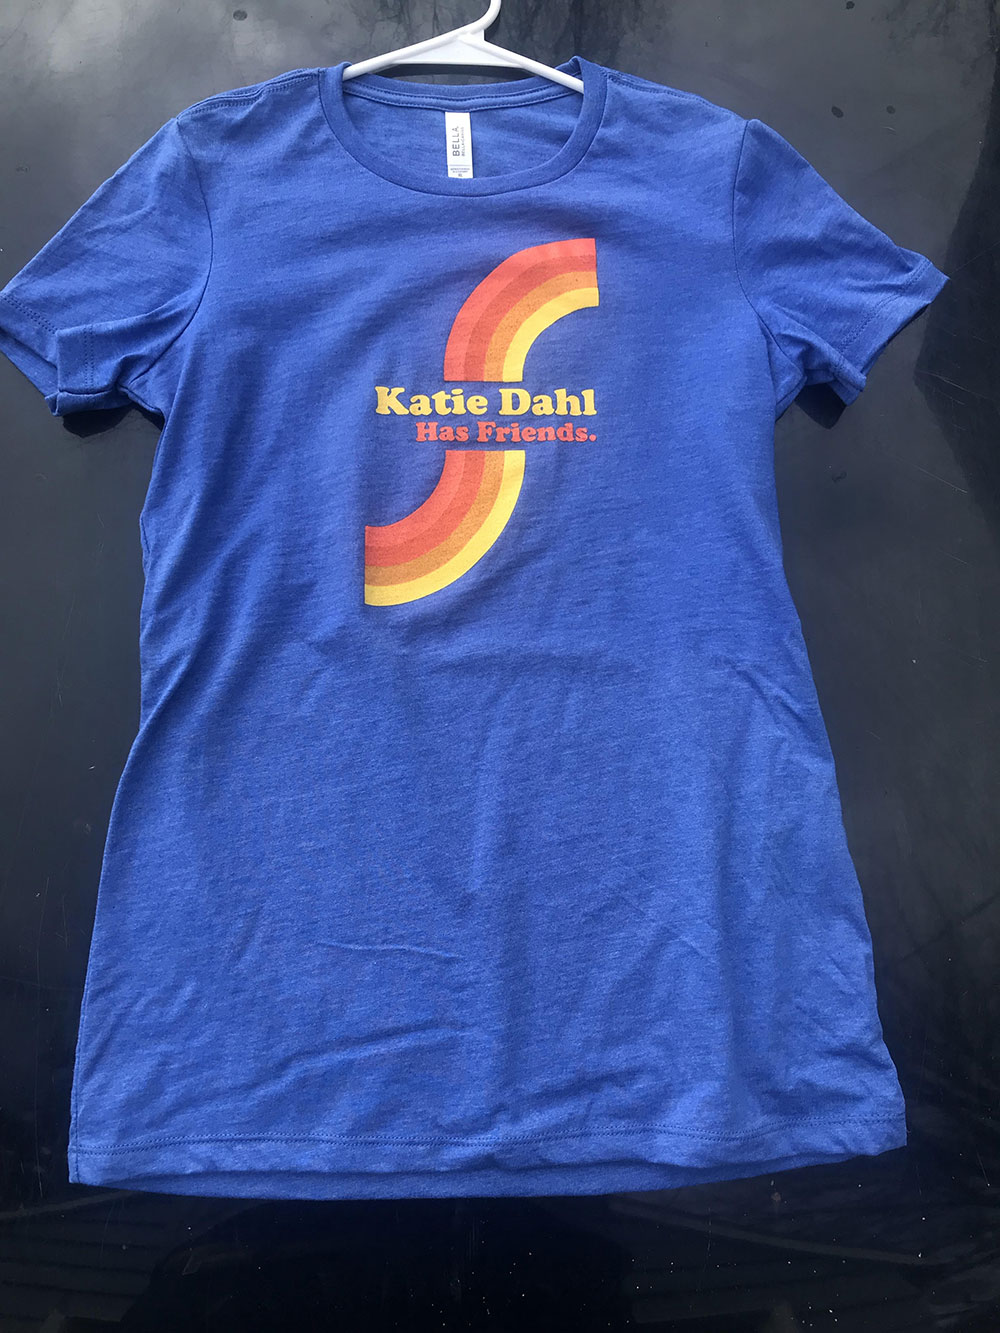 Katie Dahl Has Friends T-Shirt